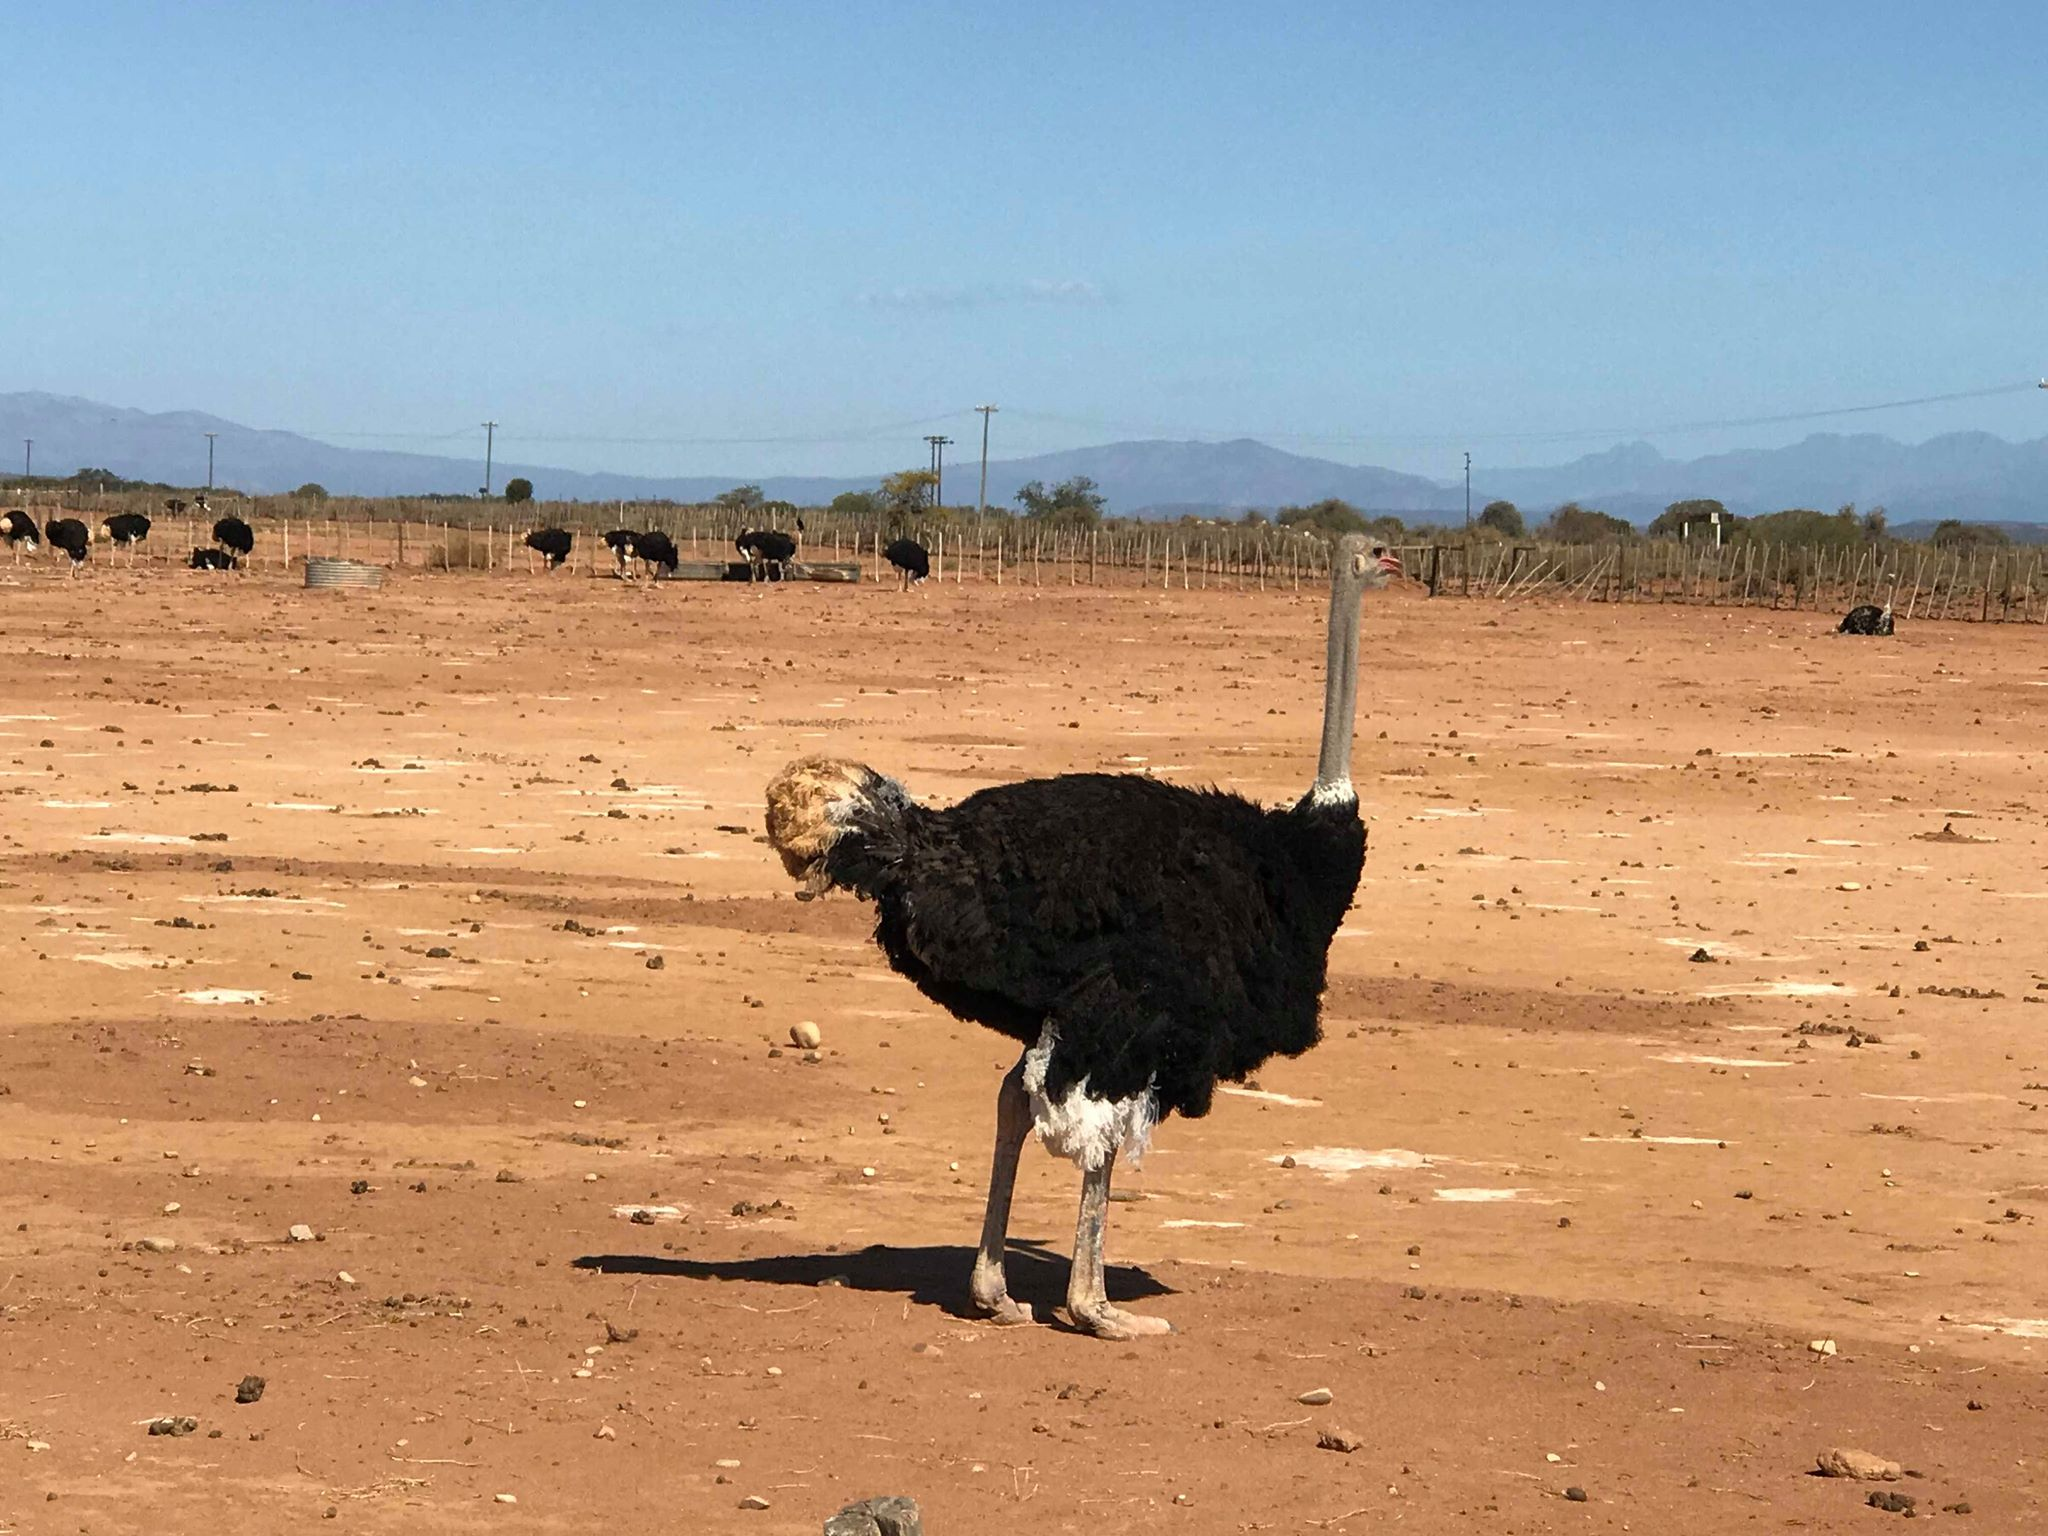 Ostridge at Cape Point